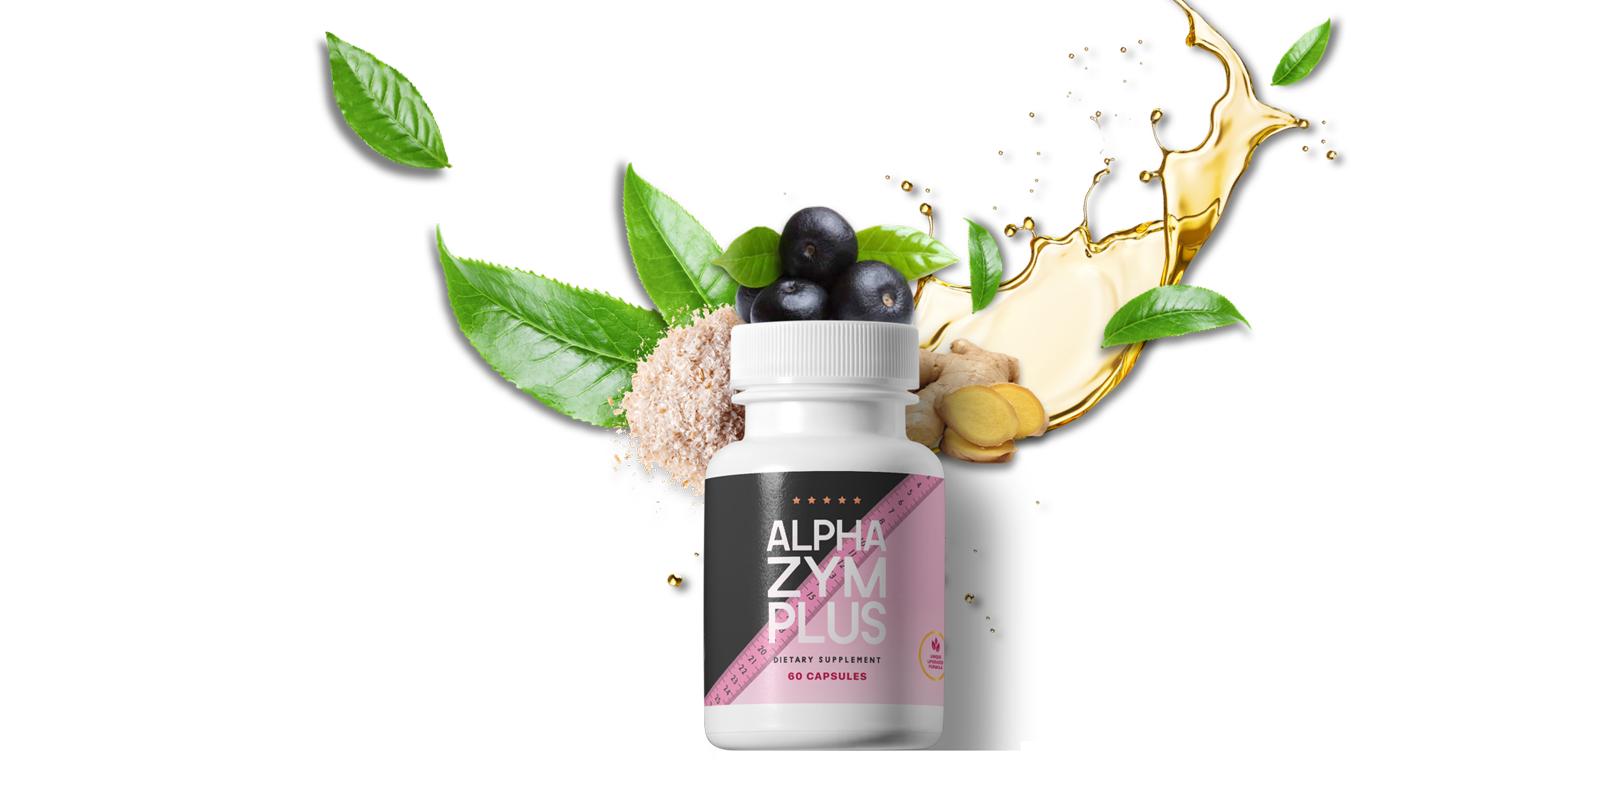 AlphaZym Plus ingredients